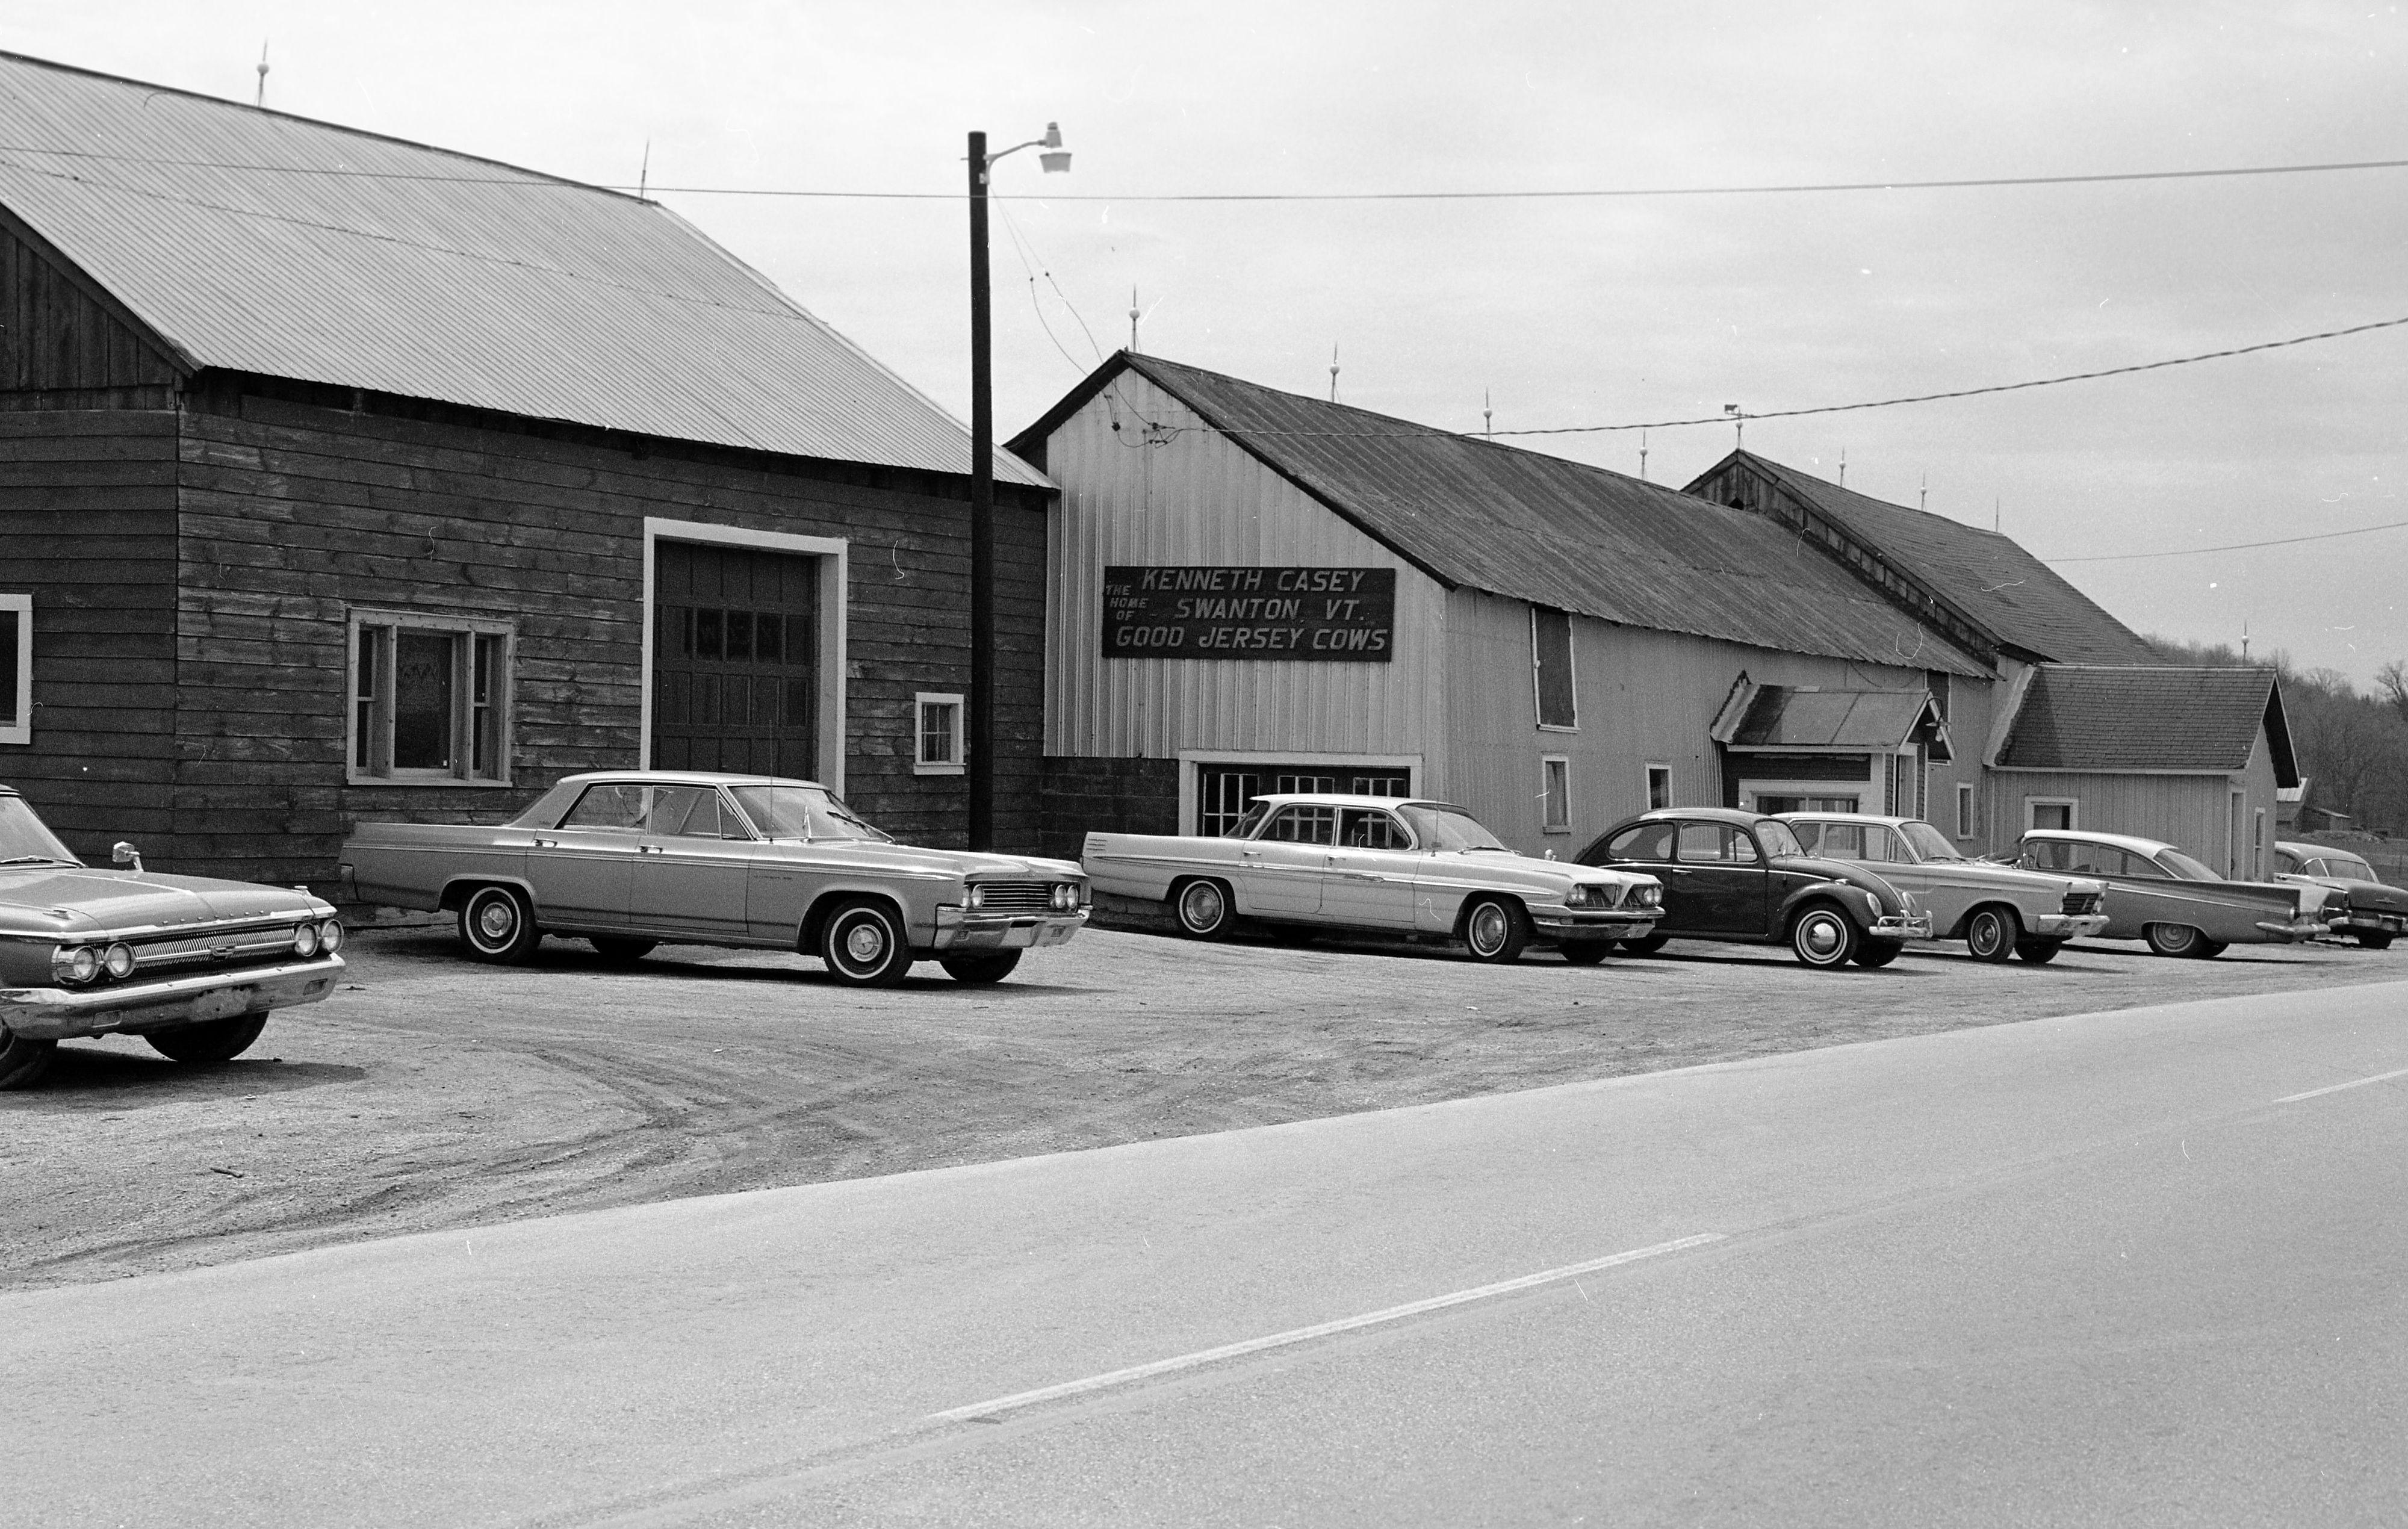 Swanton, VT, 1966. Vermont, Car dealership, Street scenes